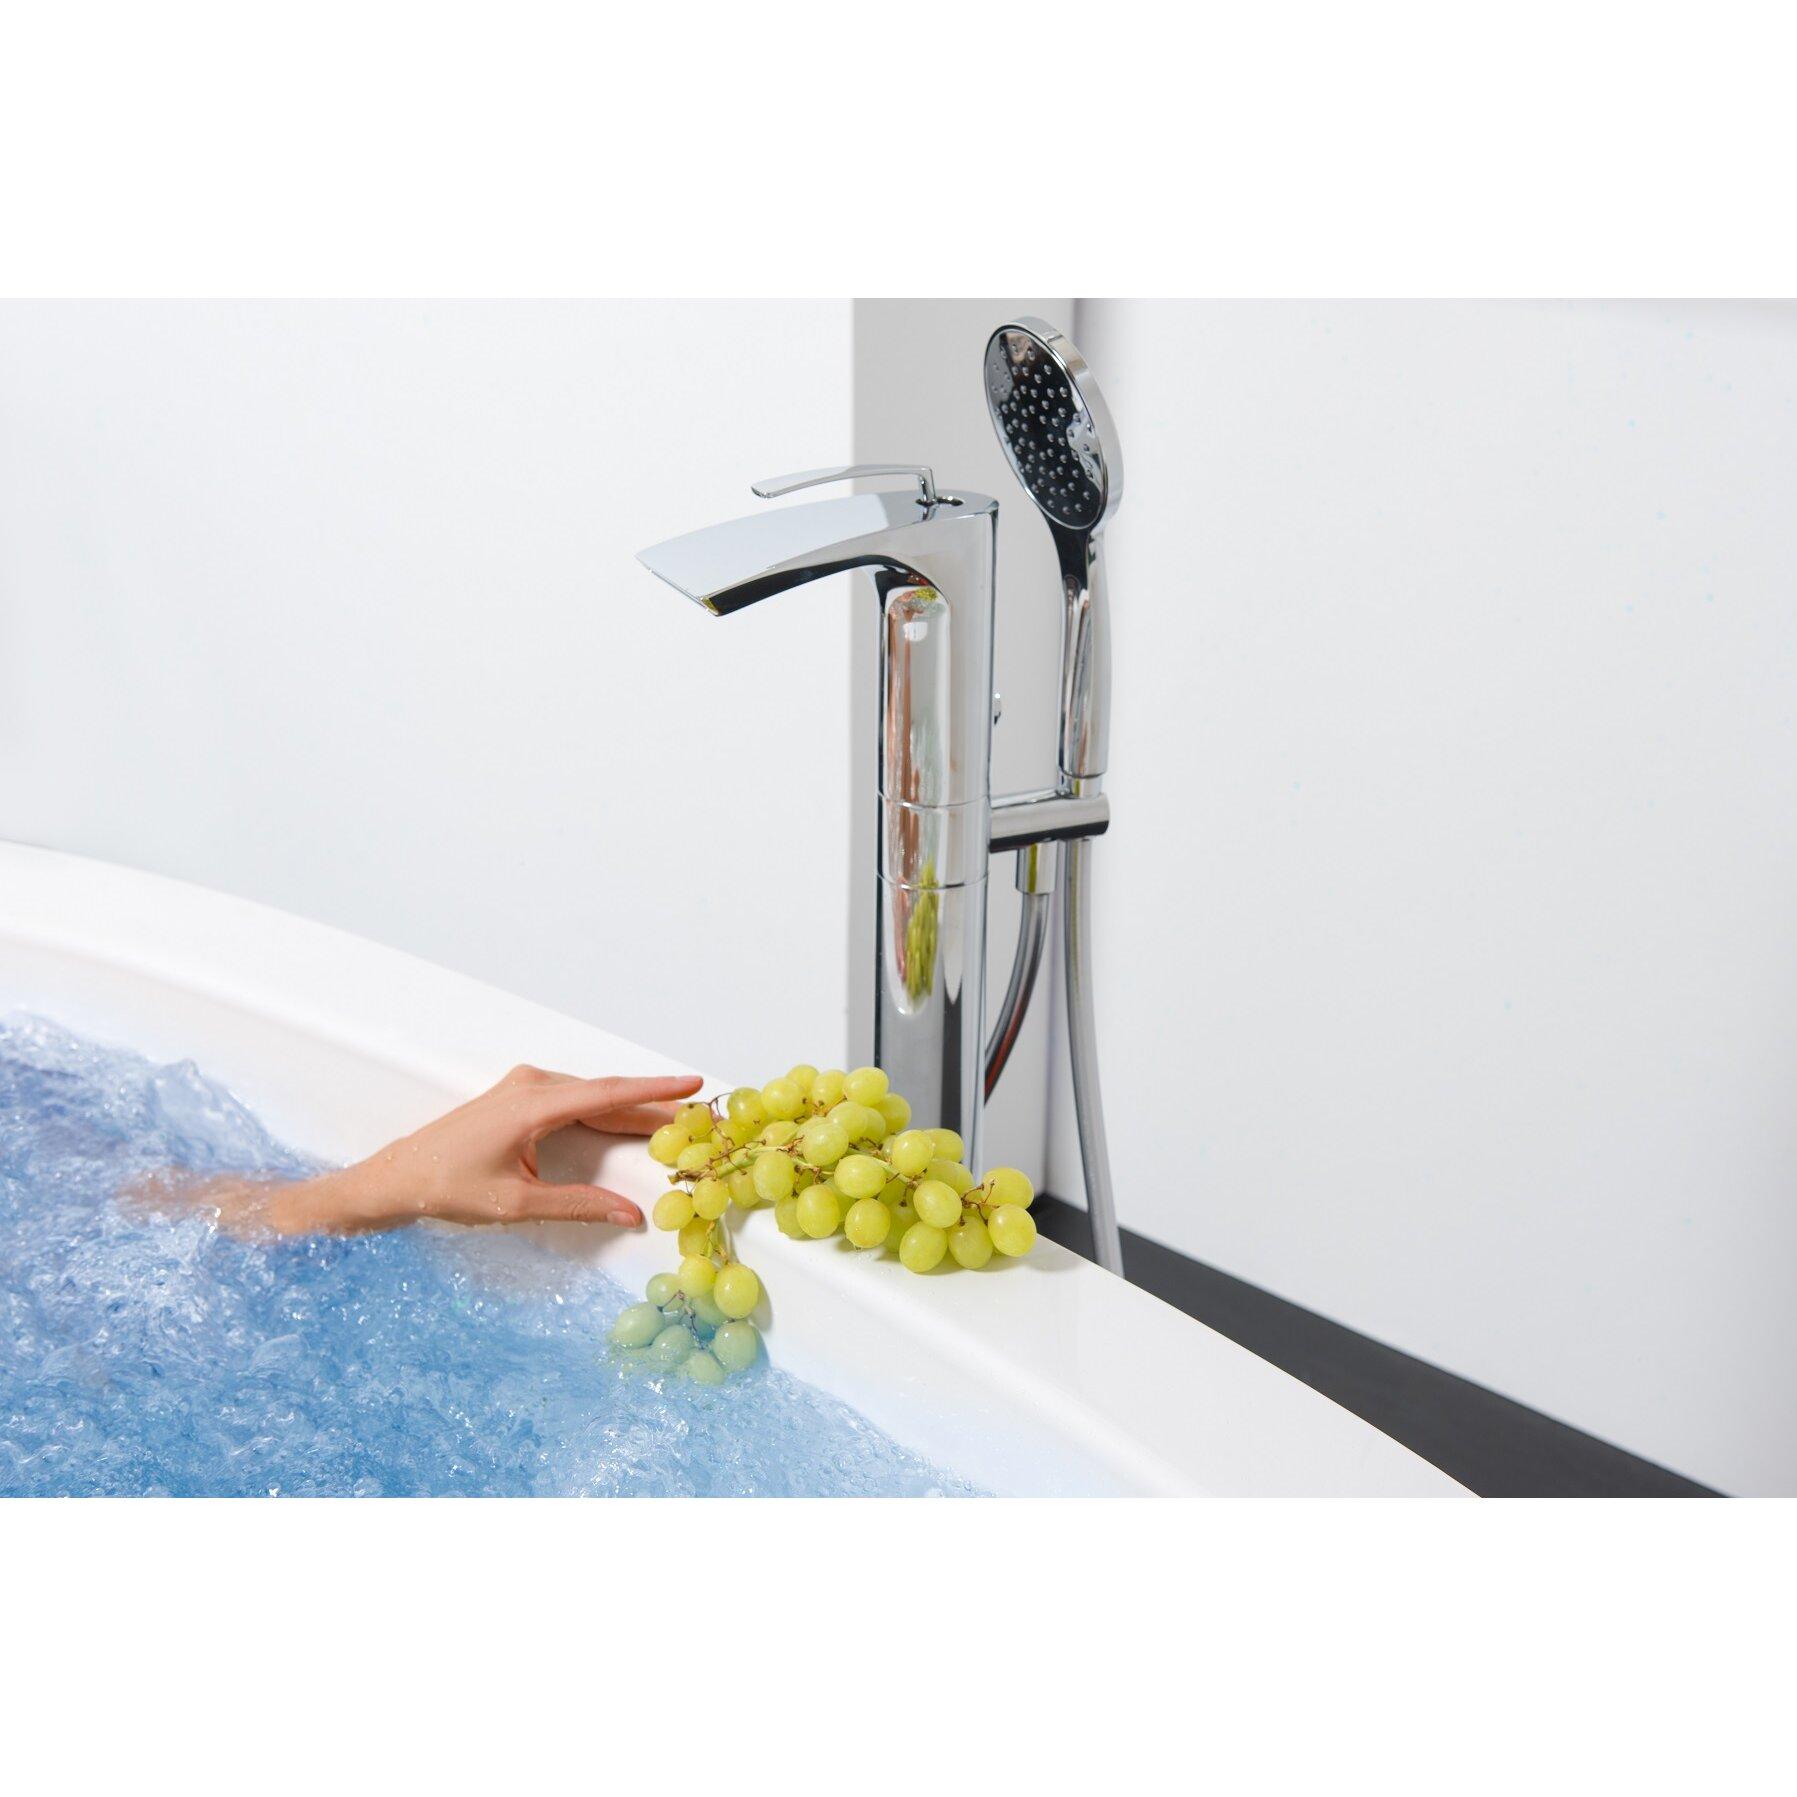 aquatica bollicine single handle floor mount bath faucet sale on bath tub faucet with handheld shower